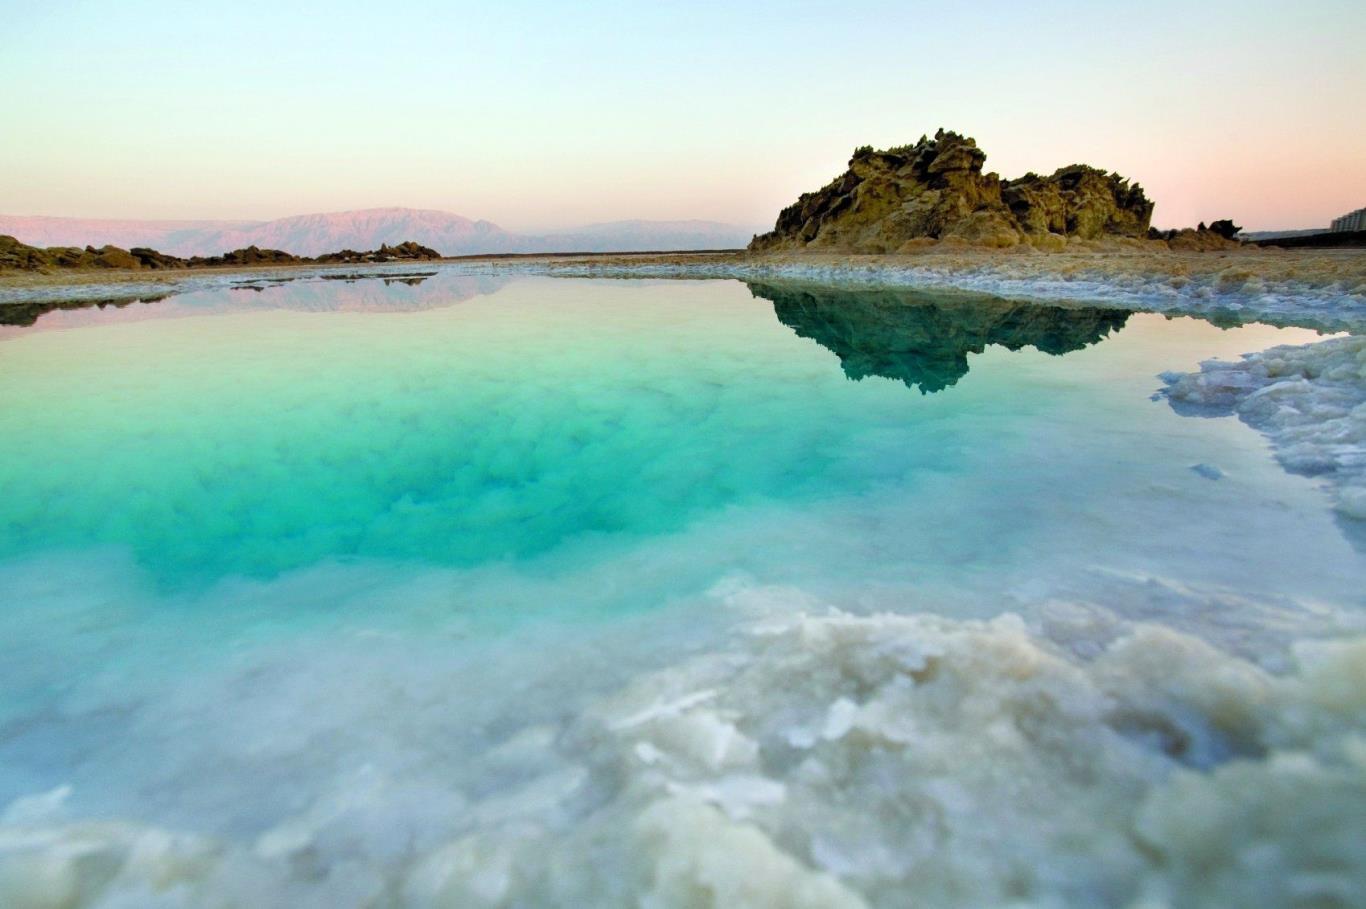 Biển chết ở Israel